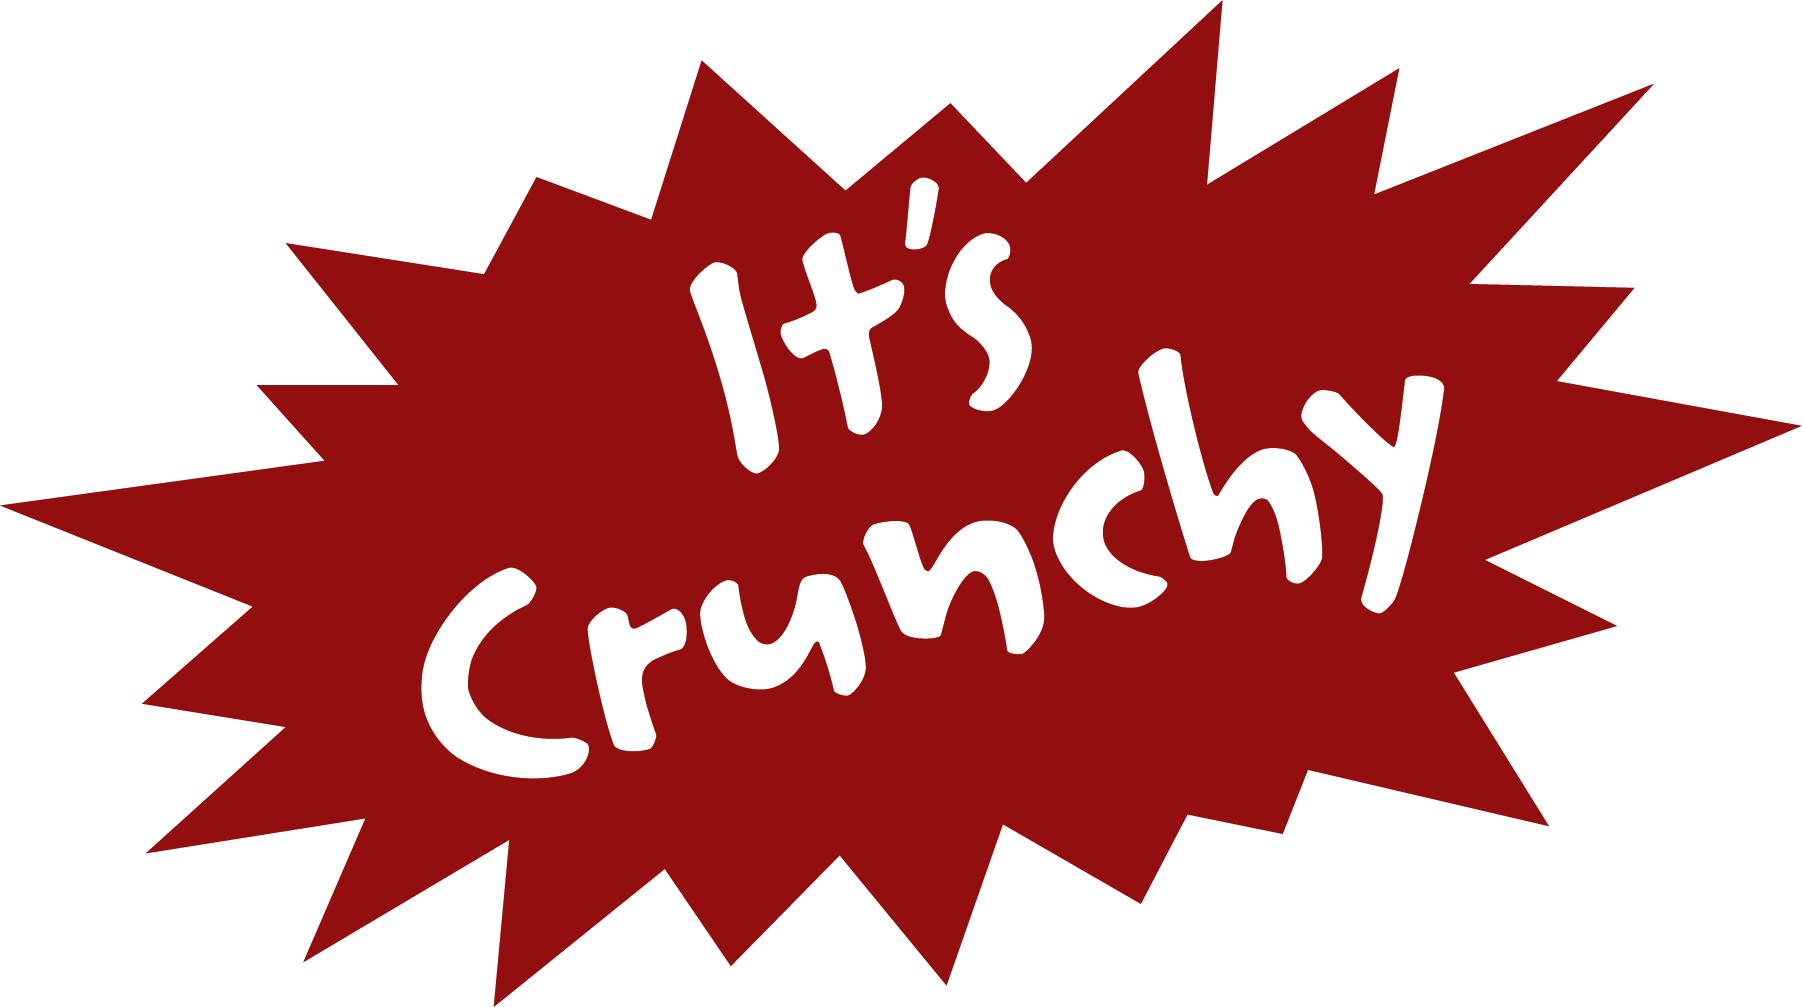 KoreanCrunchyGarlic